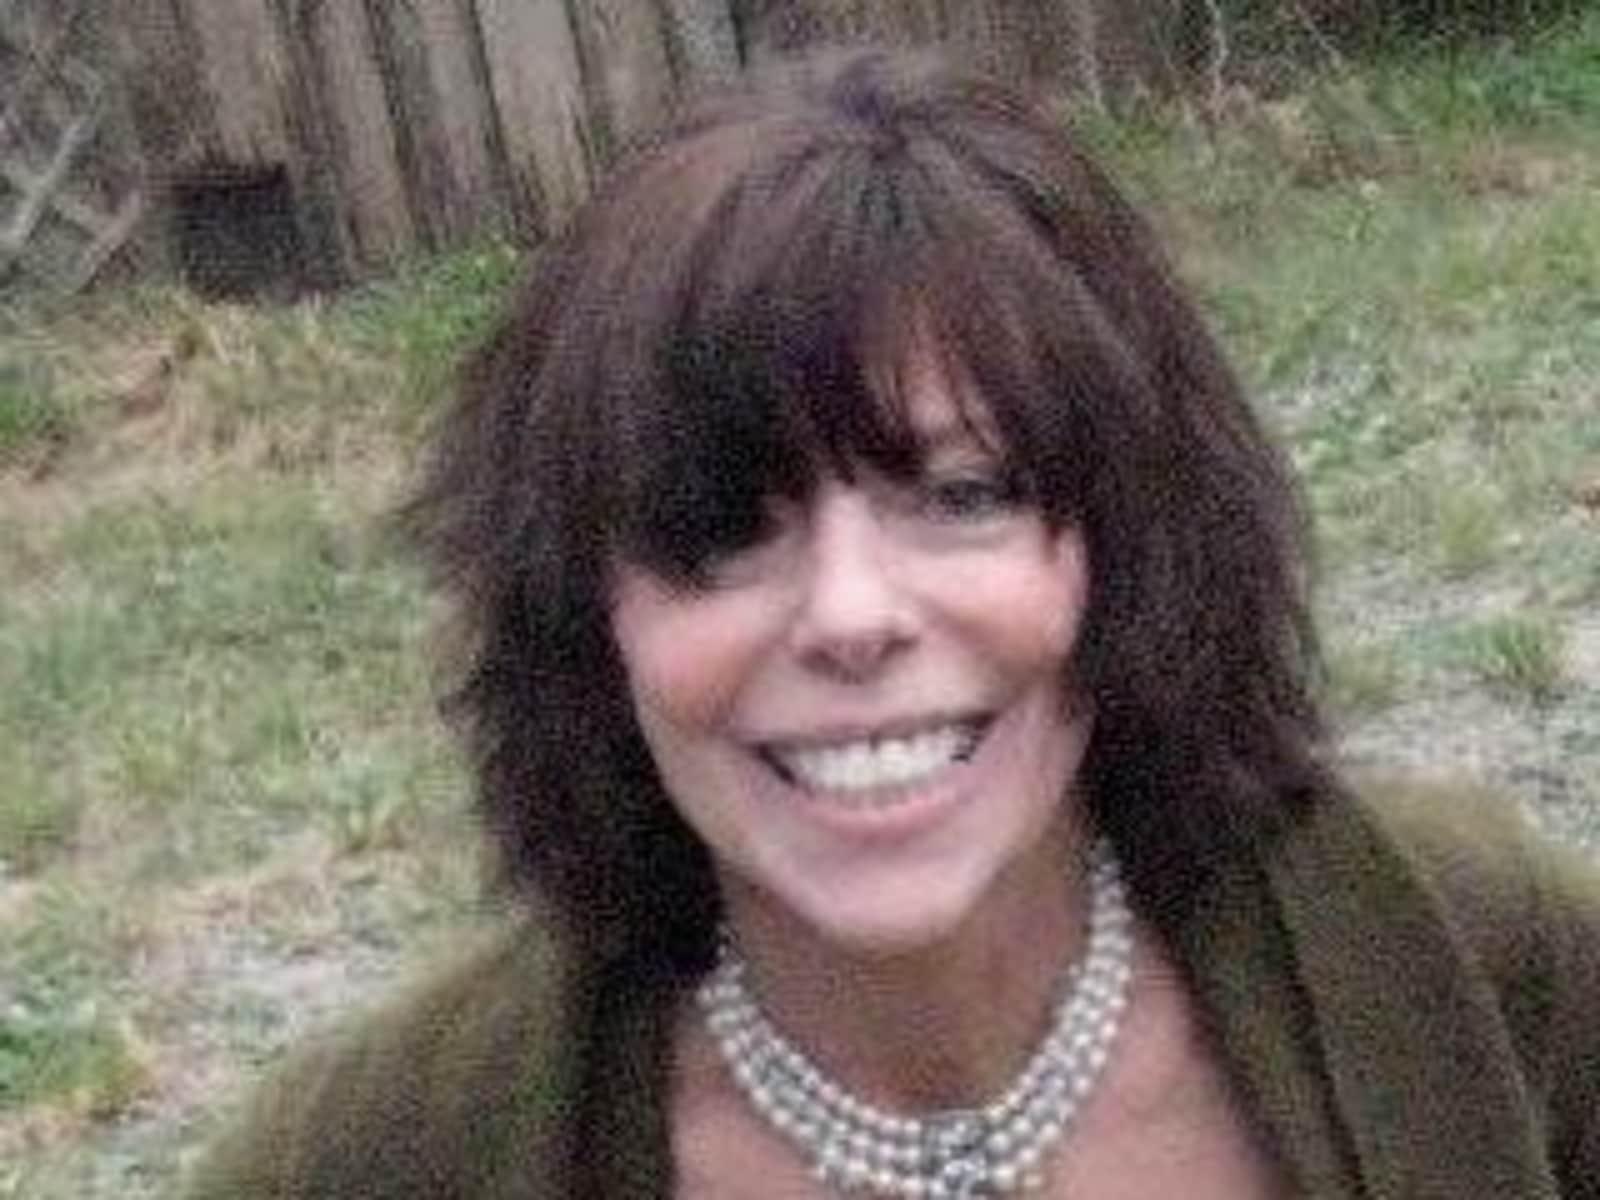 Suzanne from Manhattan, New York, United States